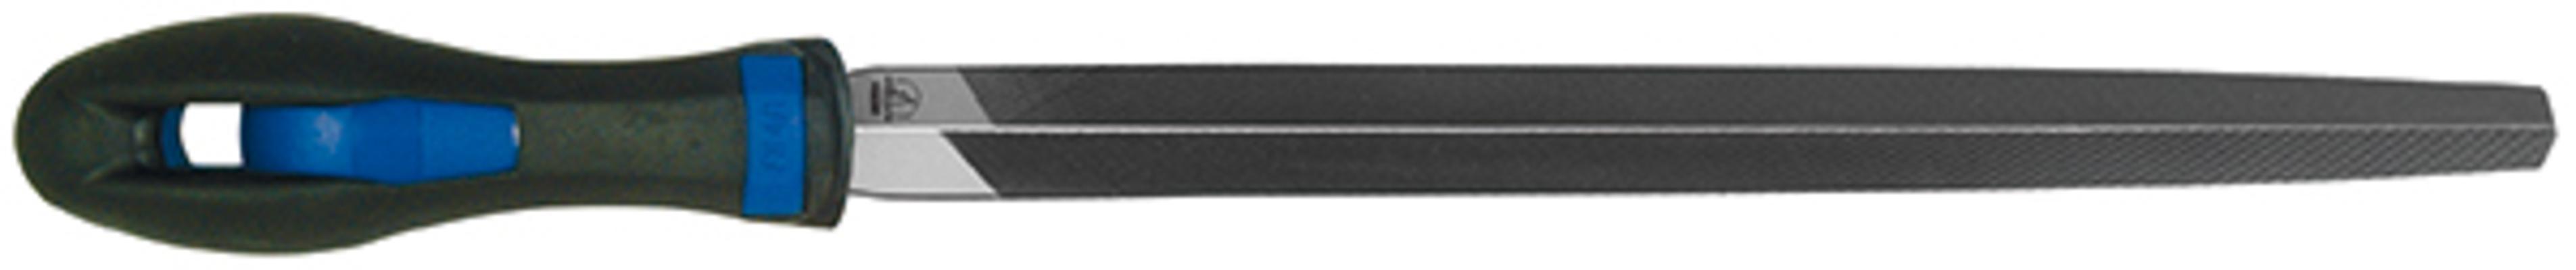 Kolmioviila, 2K-kahva, Hase - 150 mm / puolikarkea